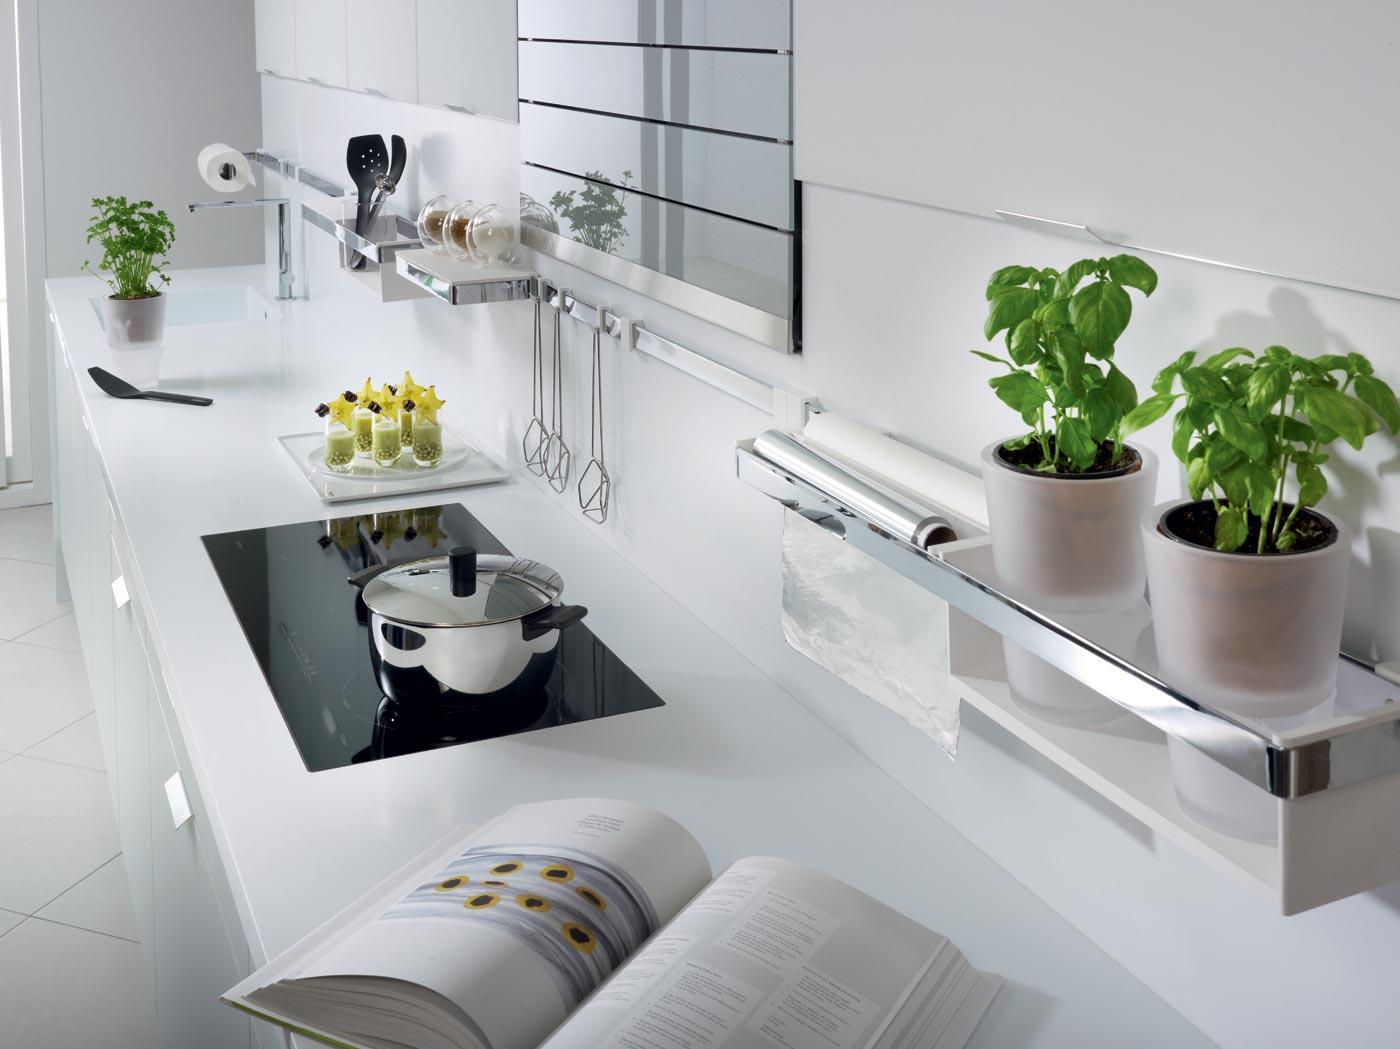 cuisine m100 m lamin blanc pur mat rustica clair structur perene lyon. Black Bedroom Furniture Sets. Home Design Ideas